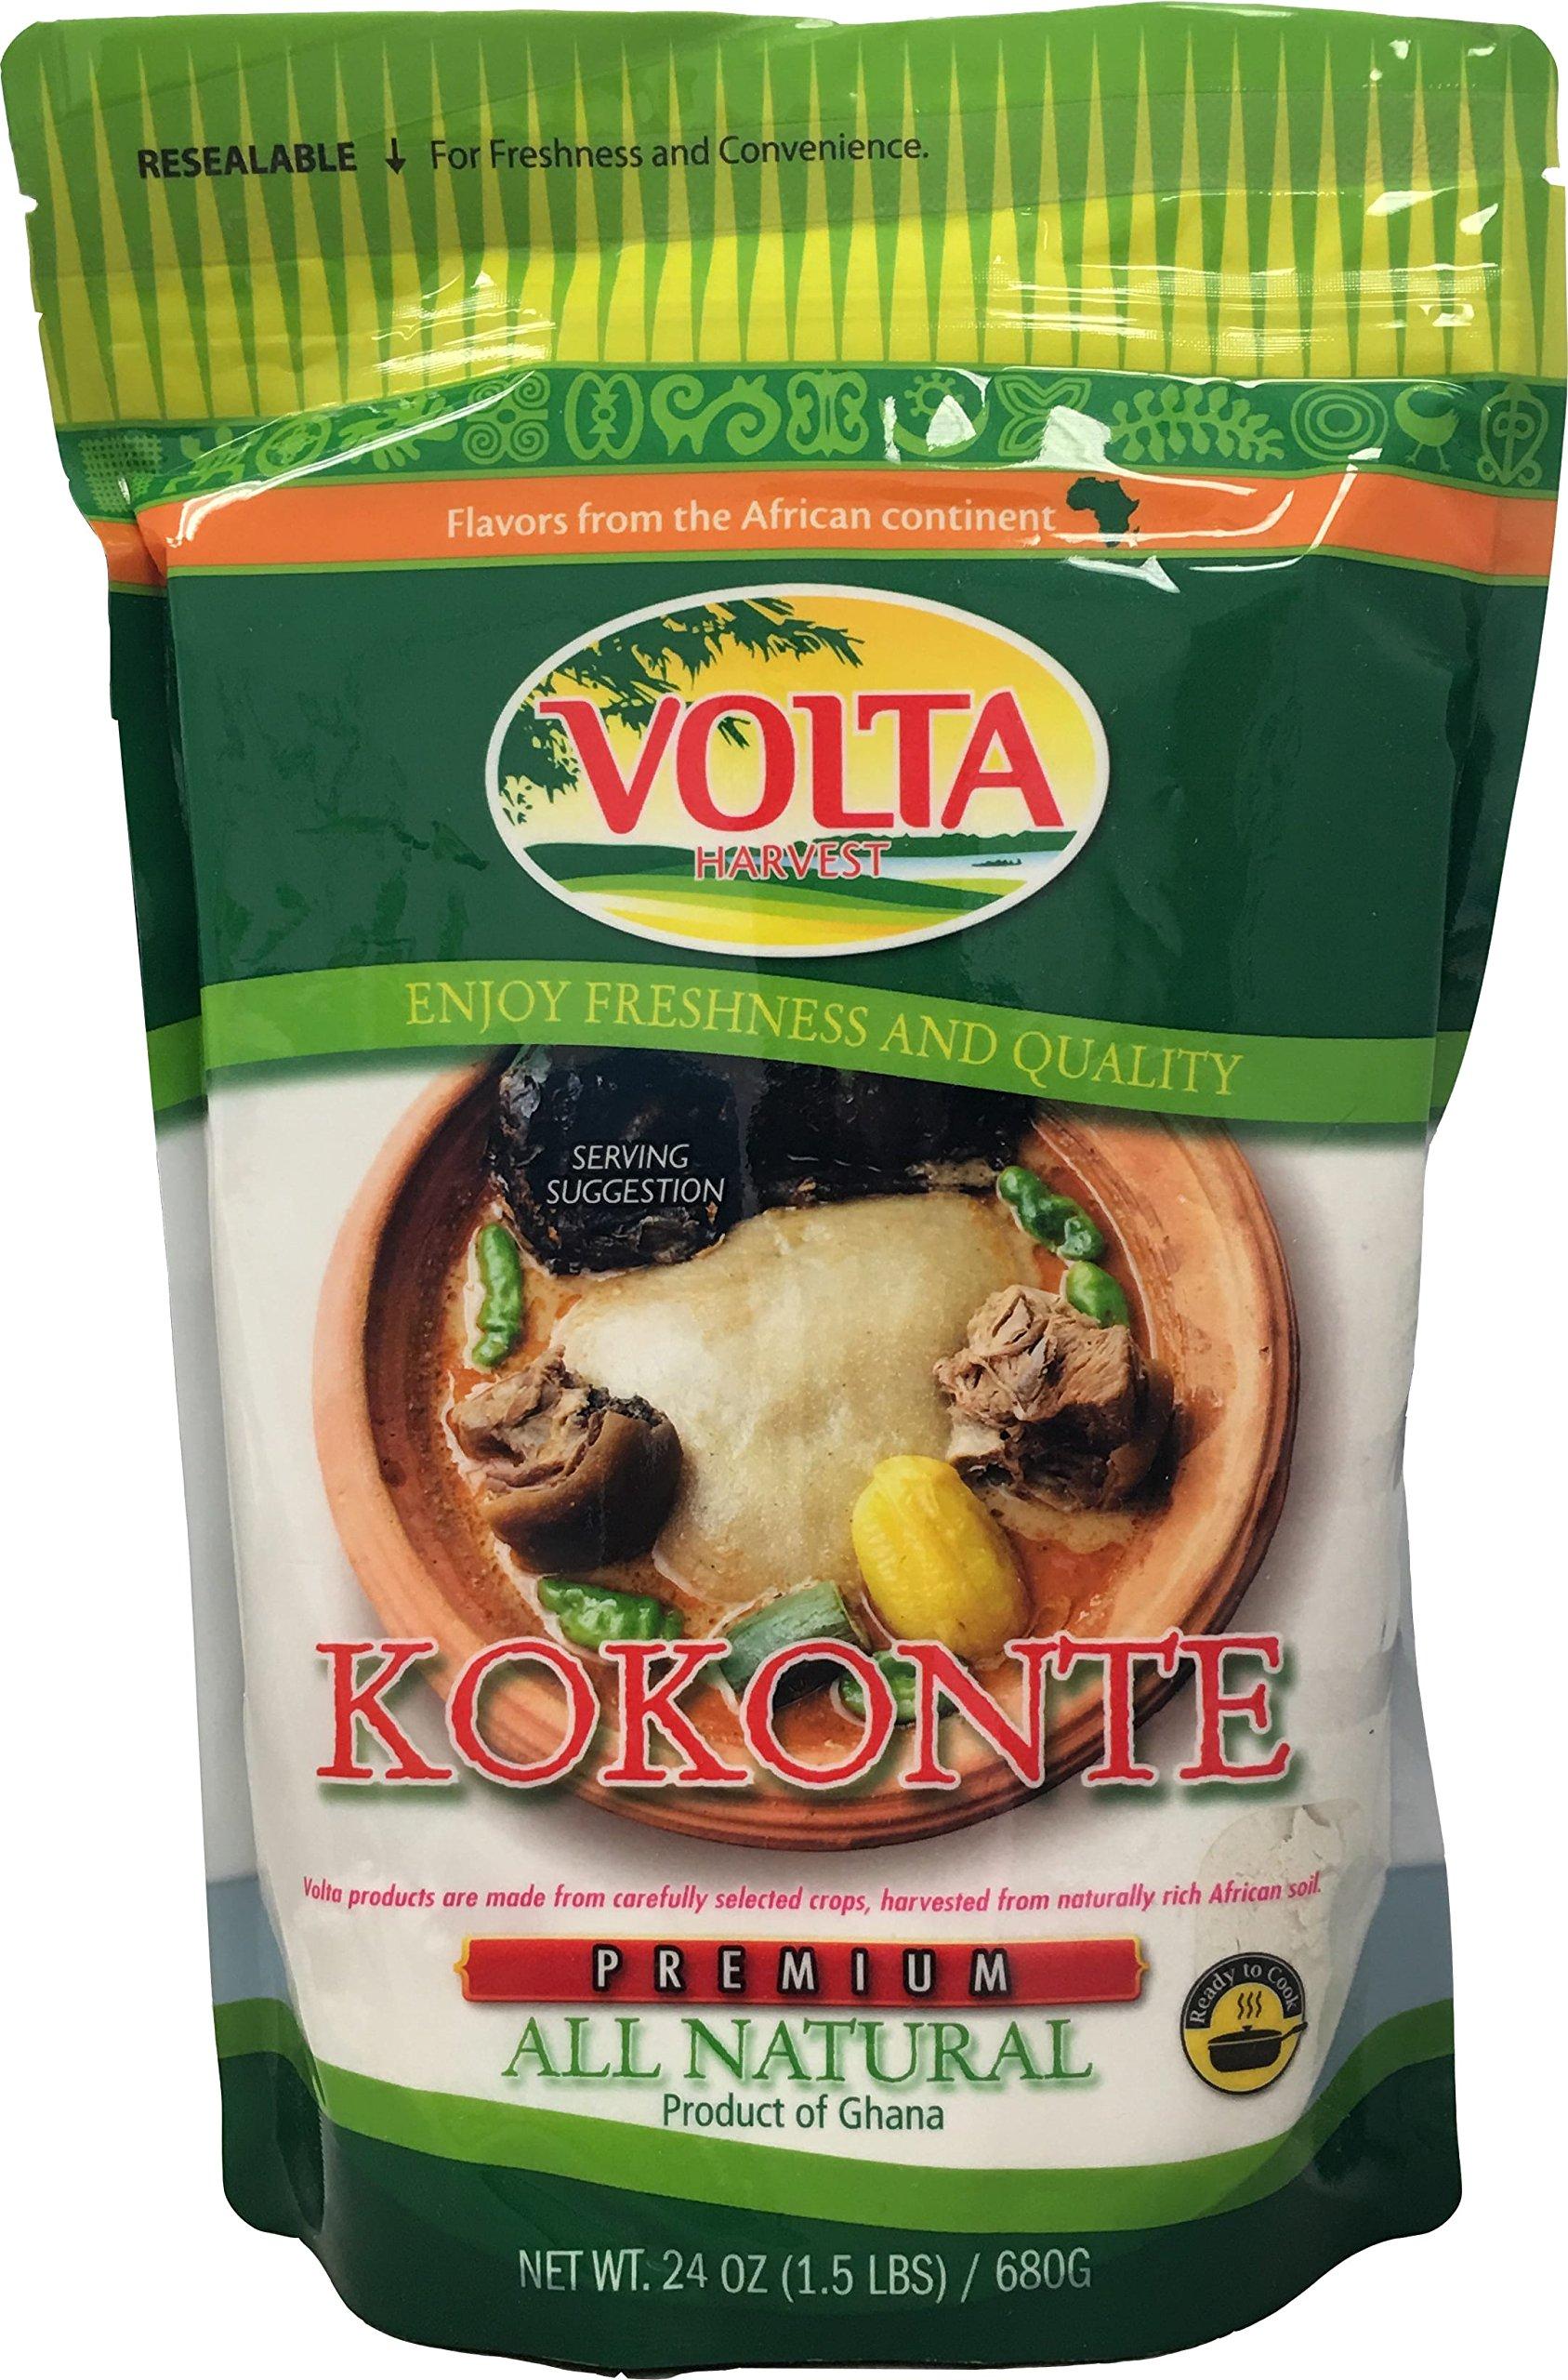 Volta Harvest Kokonte